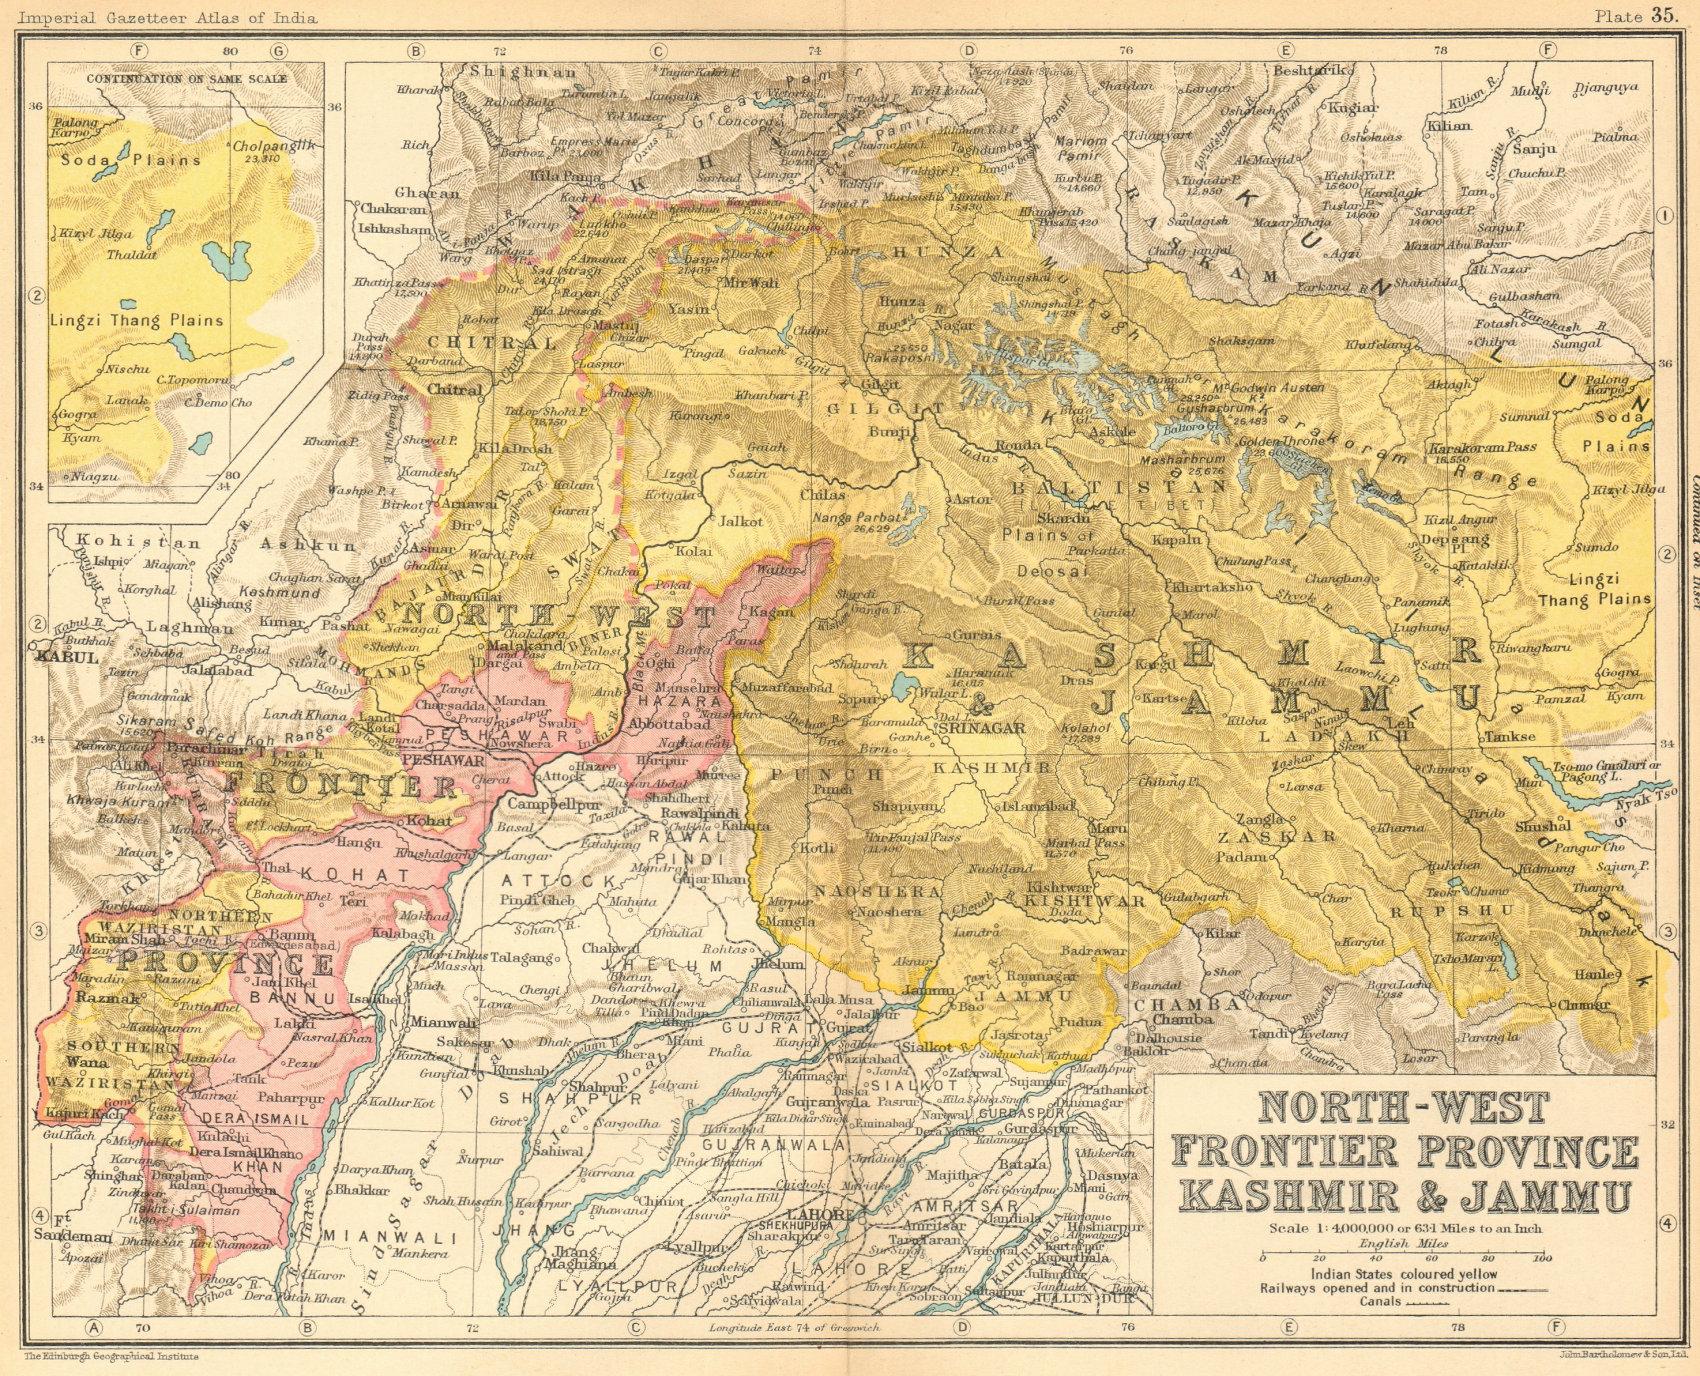 North-West Frontier Province, Jammu & Kashmir'. British India/Pakistan 1931 map